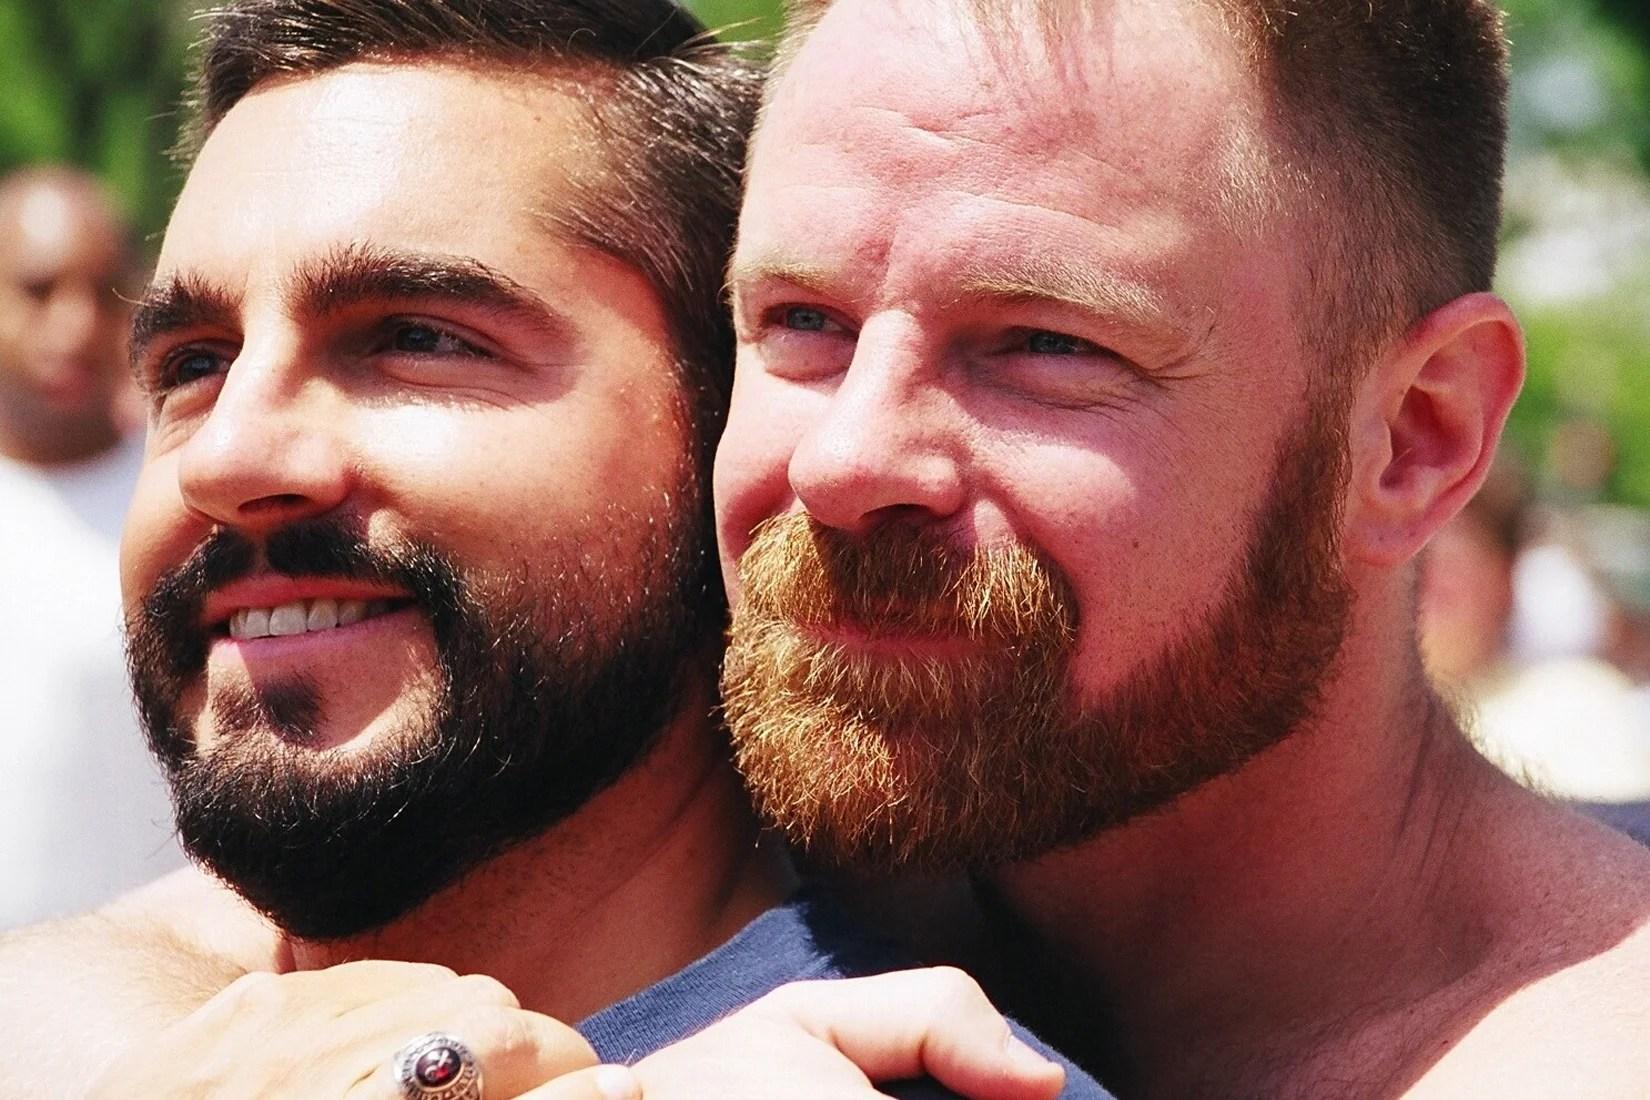 gay bear dad on son